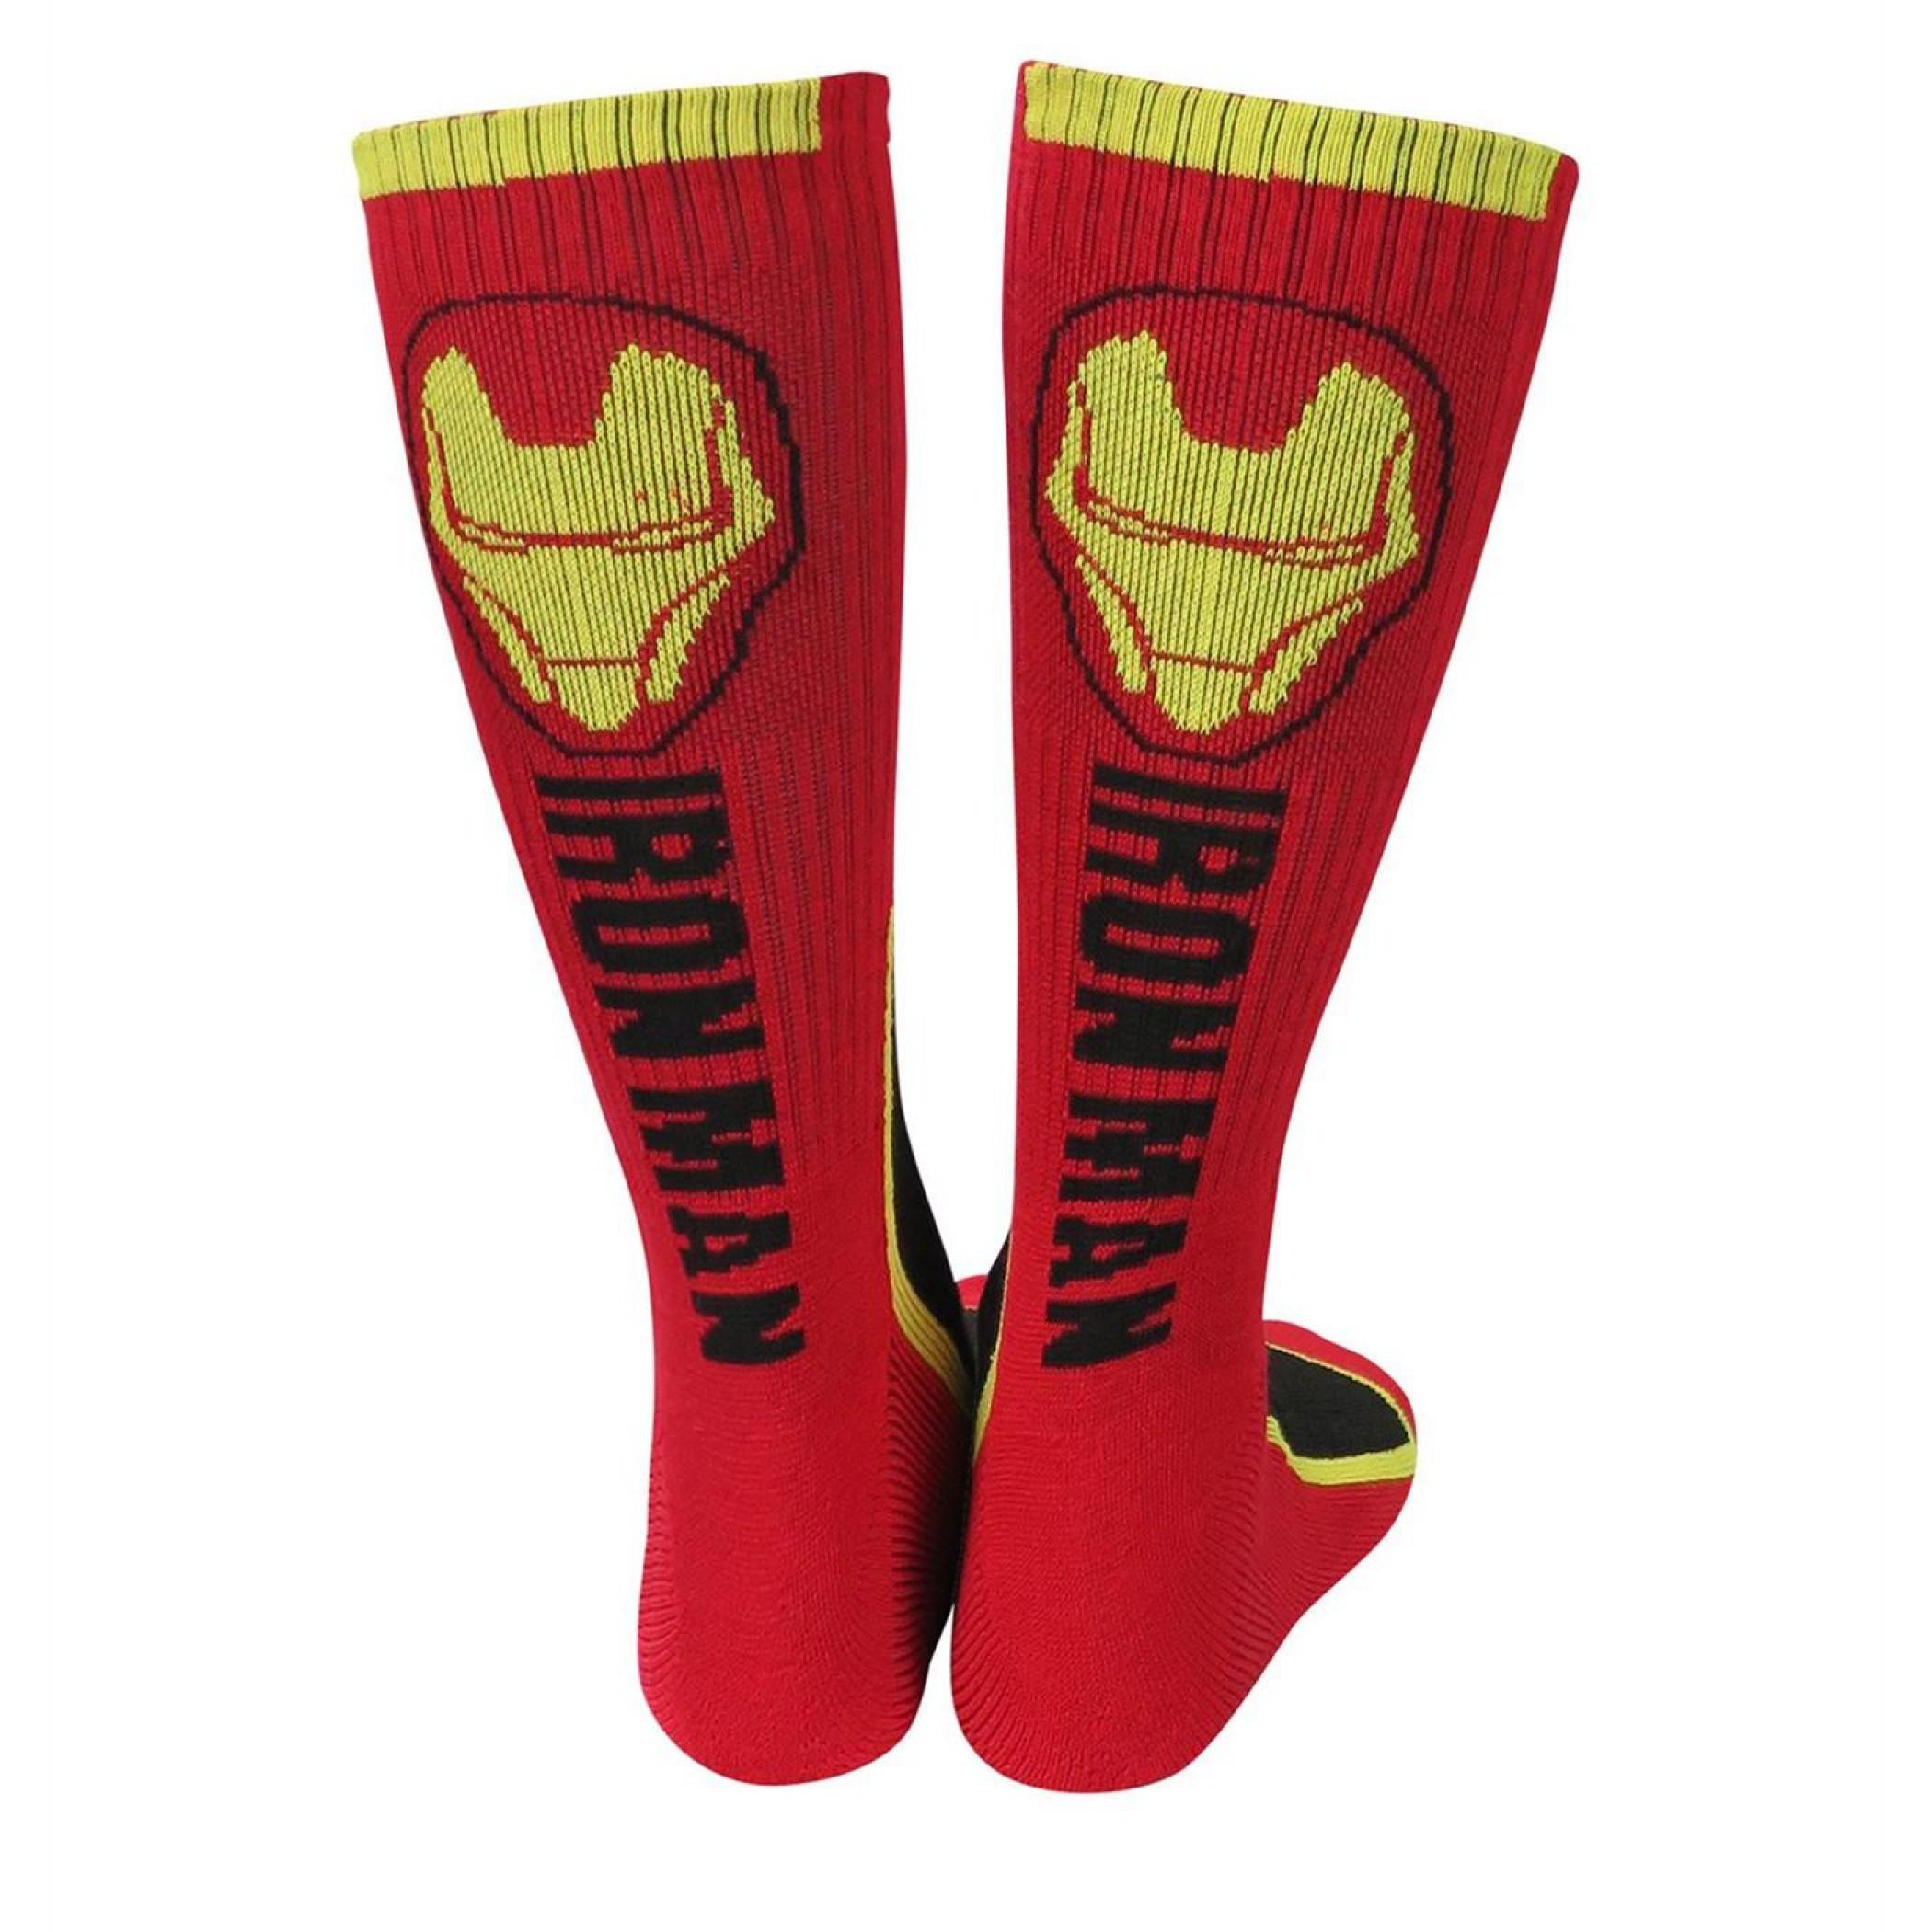 Captain America and Iron Man 2-Pair Pack of Crew Socks